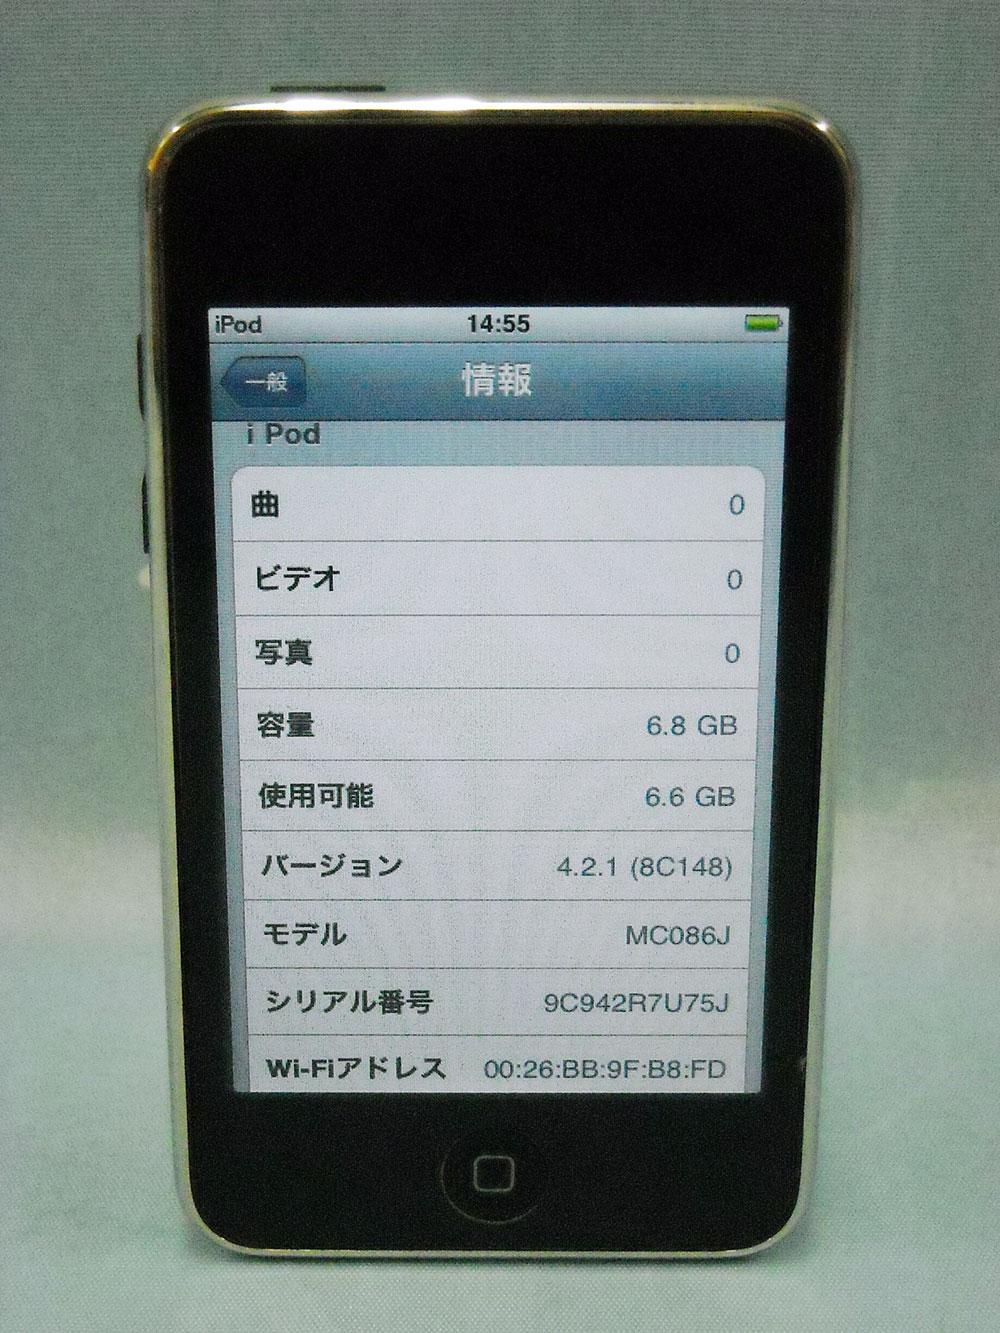 APPLE iPod| ハードオフ西尾店